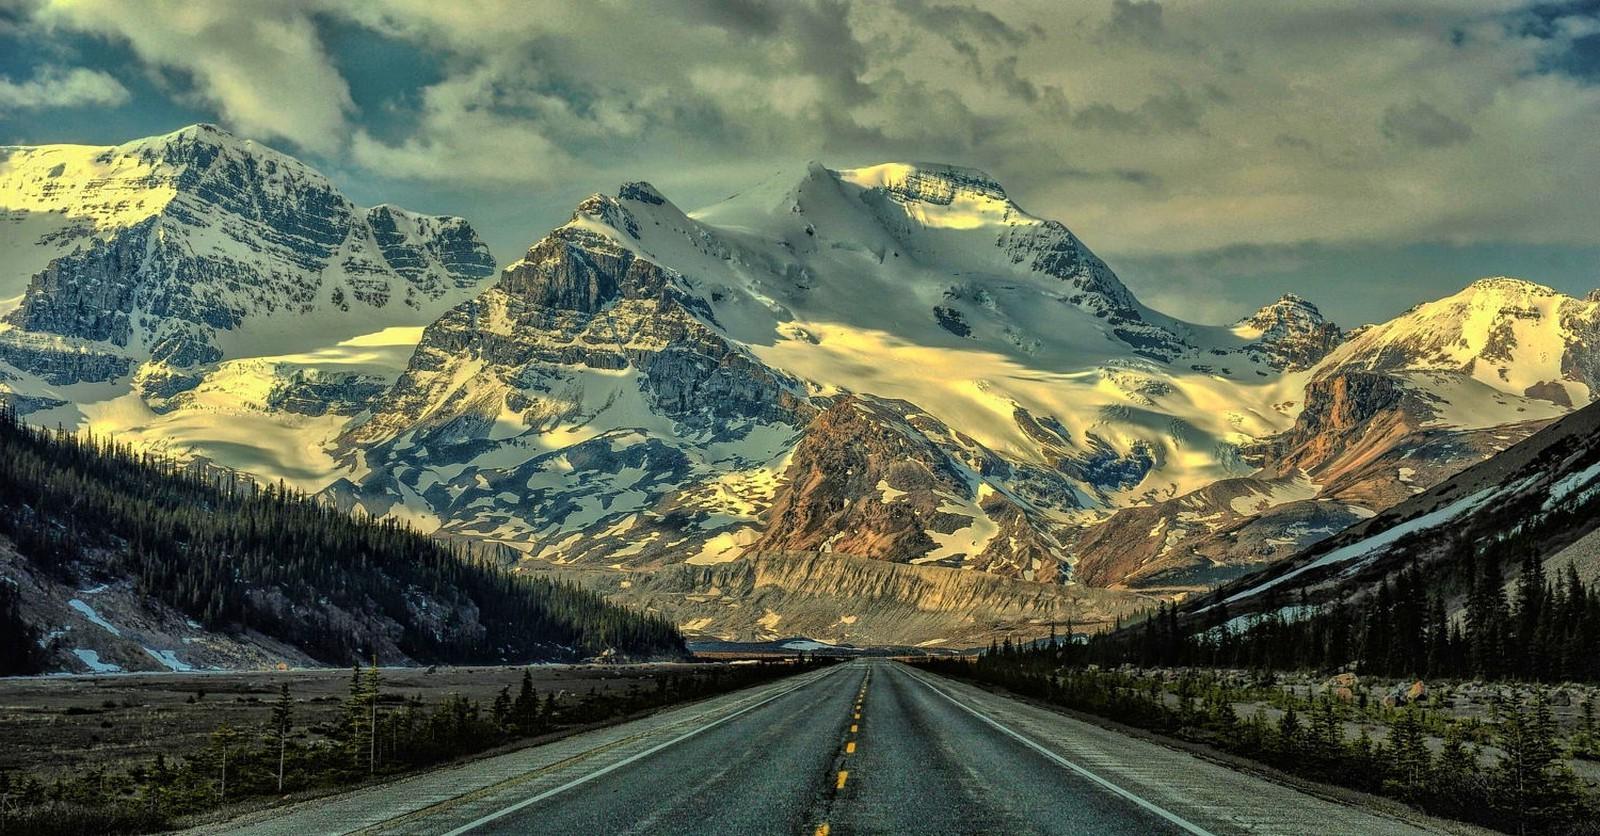 3d Forest Wallpaper Backgrounds Nature Landscape Mountains Snowy Peak Road Forest